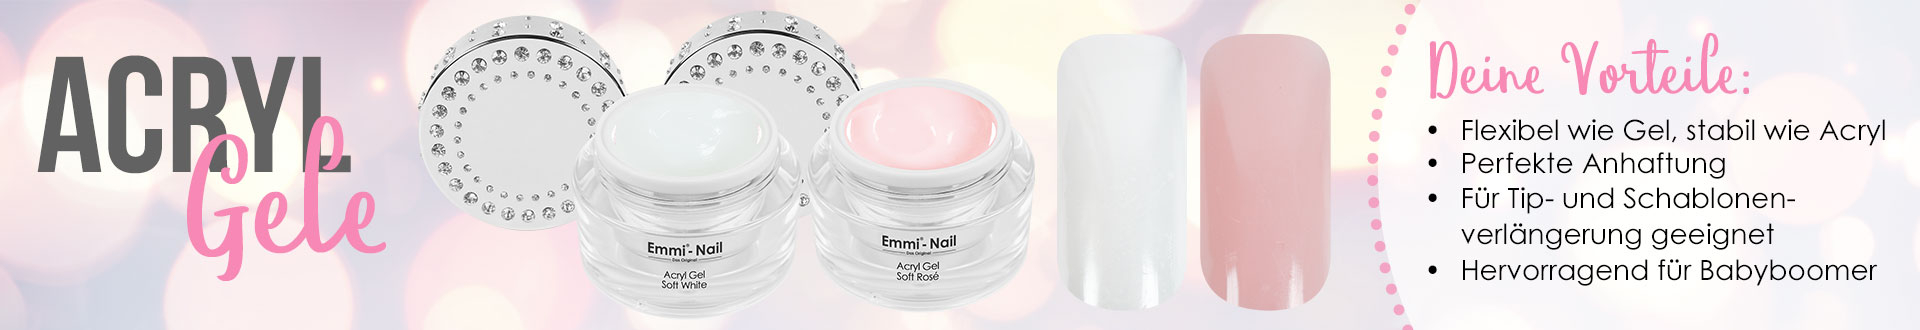 Acryl Gel Günstig Online Kaufen Emmi Nail